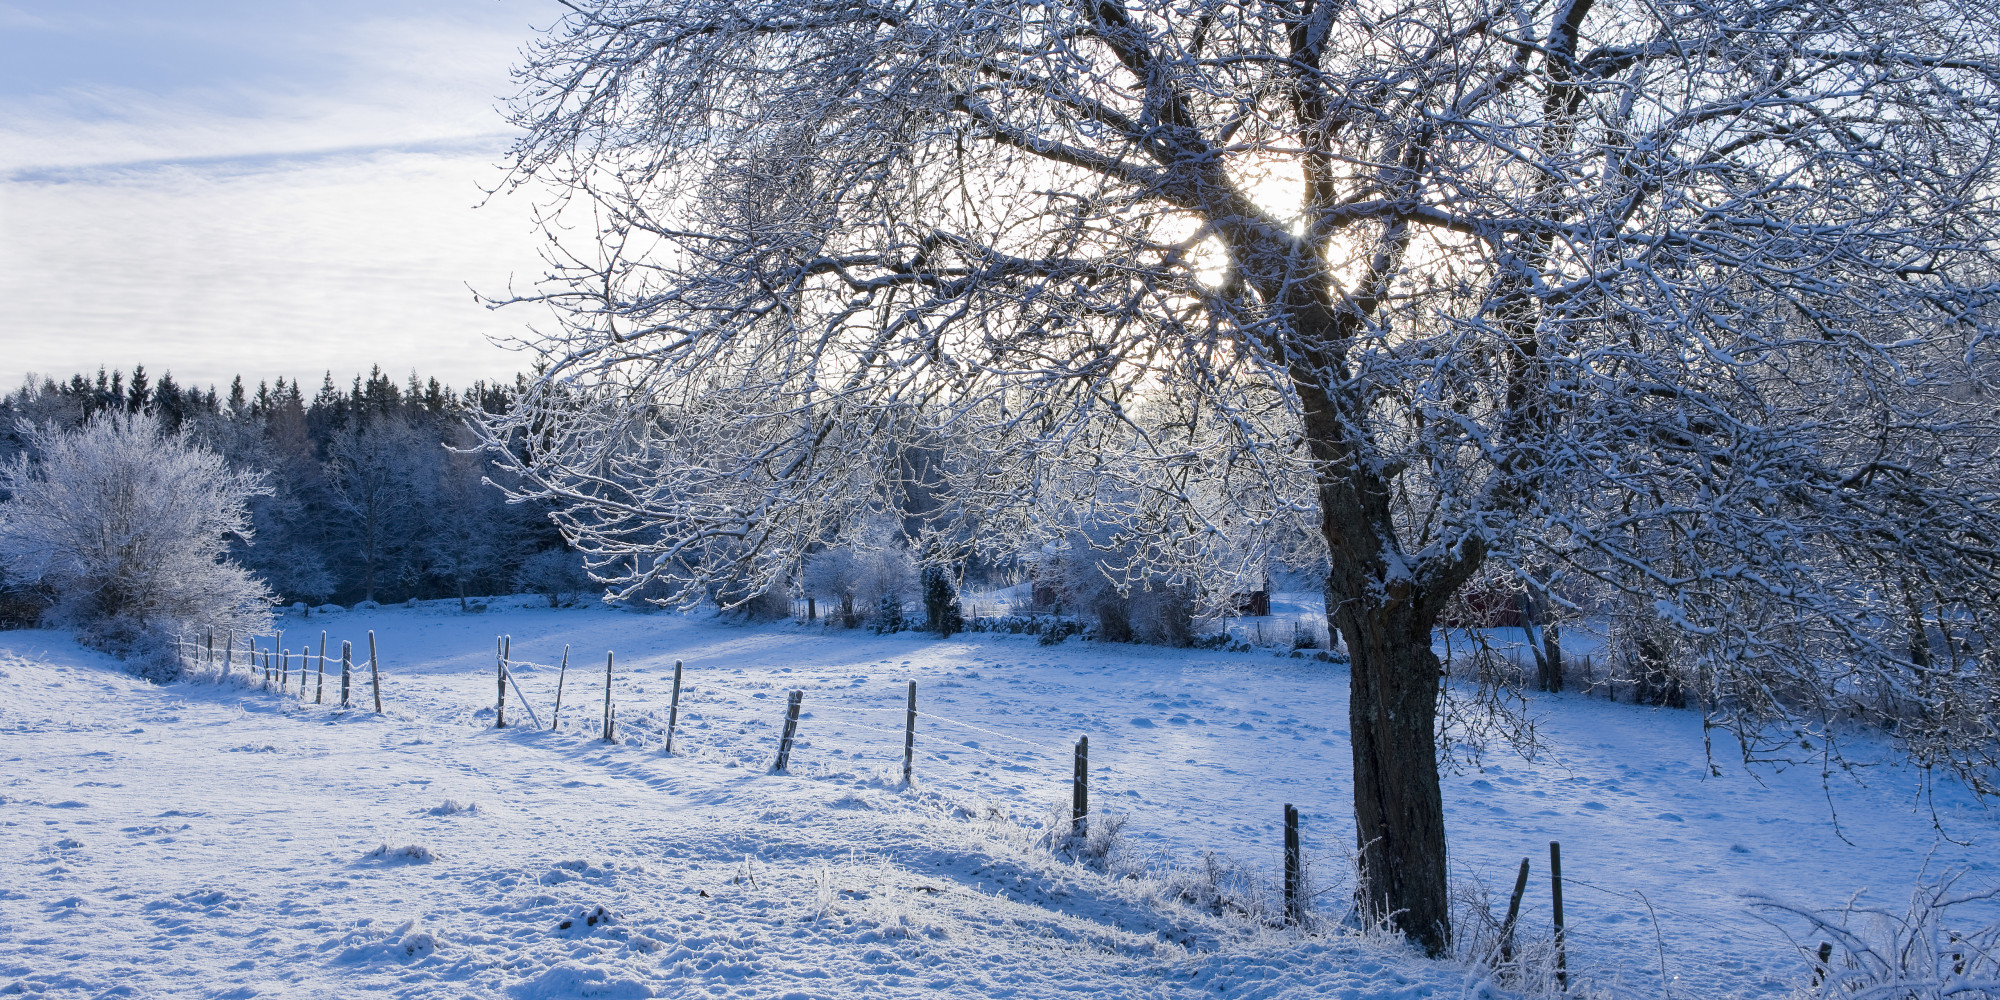 Mac Pro Fall Wallpaper 2017 10 Winter Wonderlands To Energize Your Spirit Photos